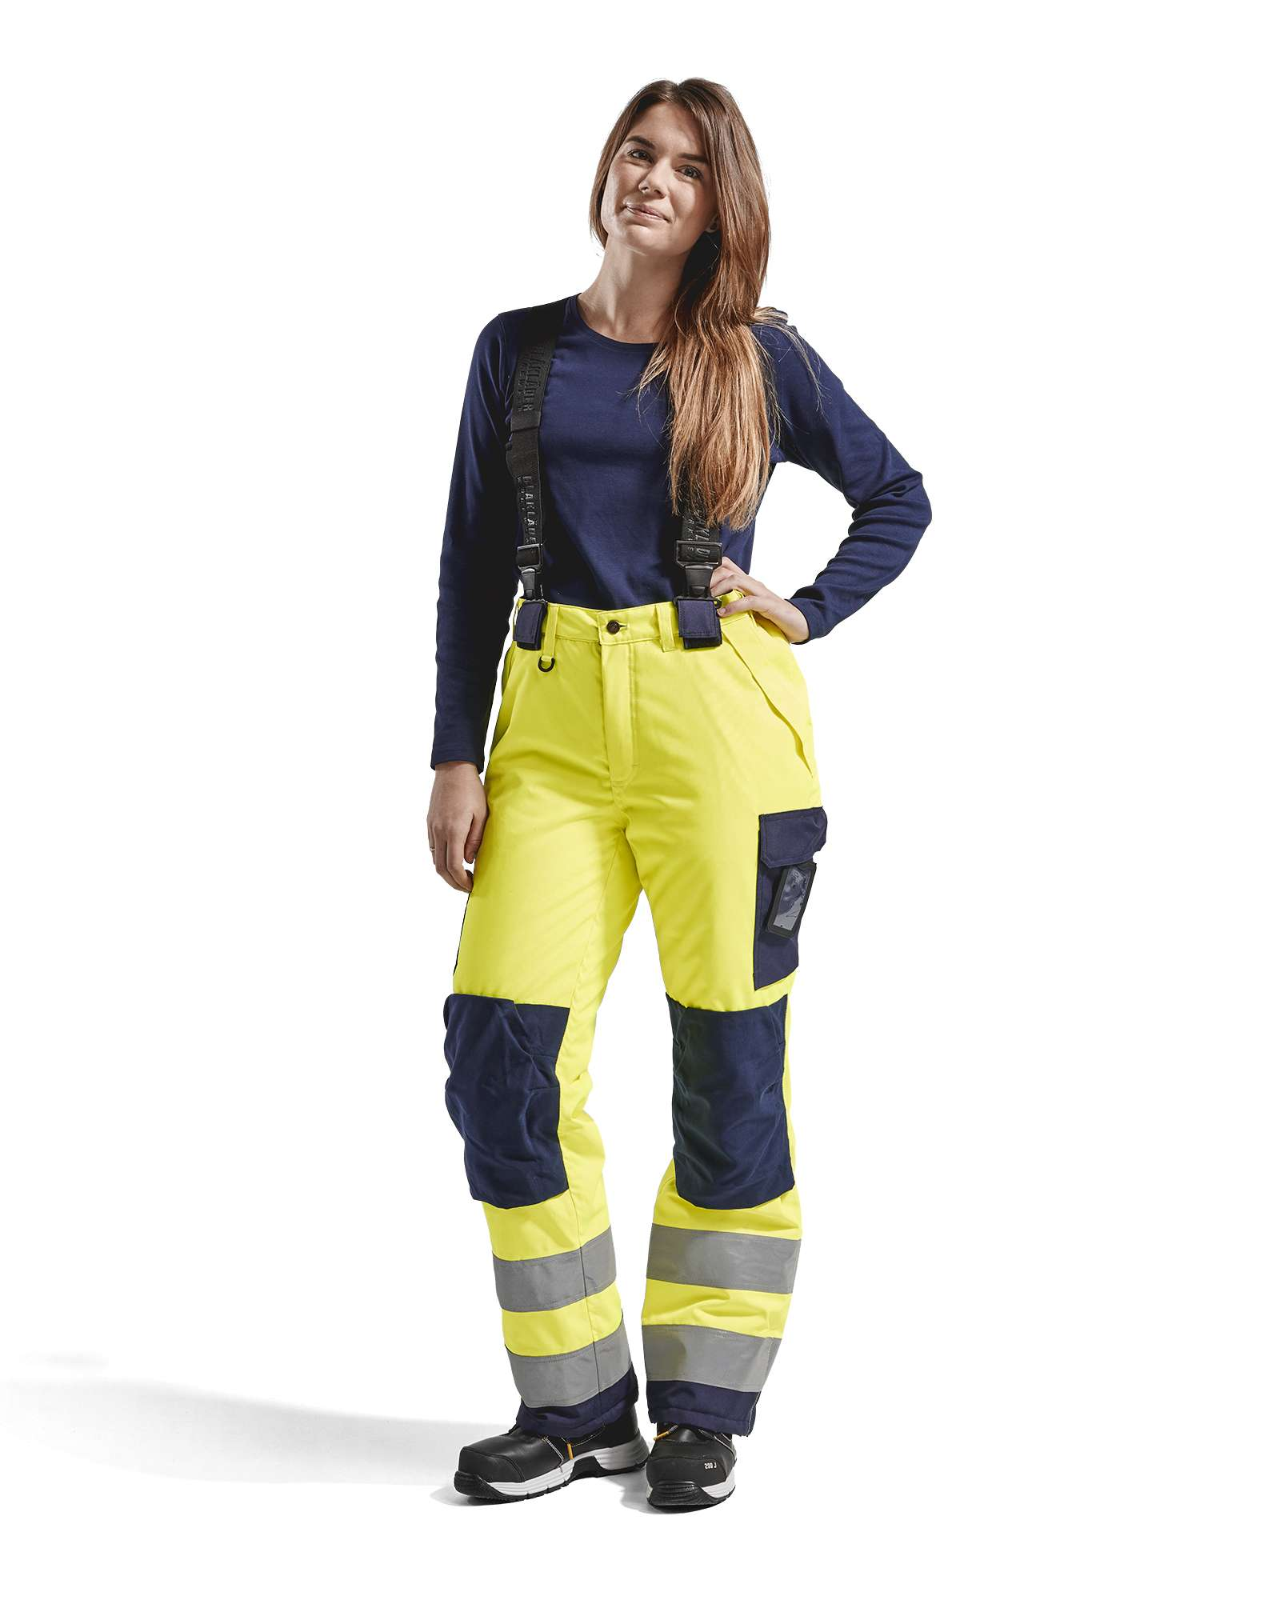 Blaklader Dames winterwerkbroeken 78851977 High Vis geel-marineblauw(3389)